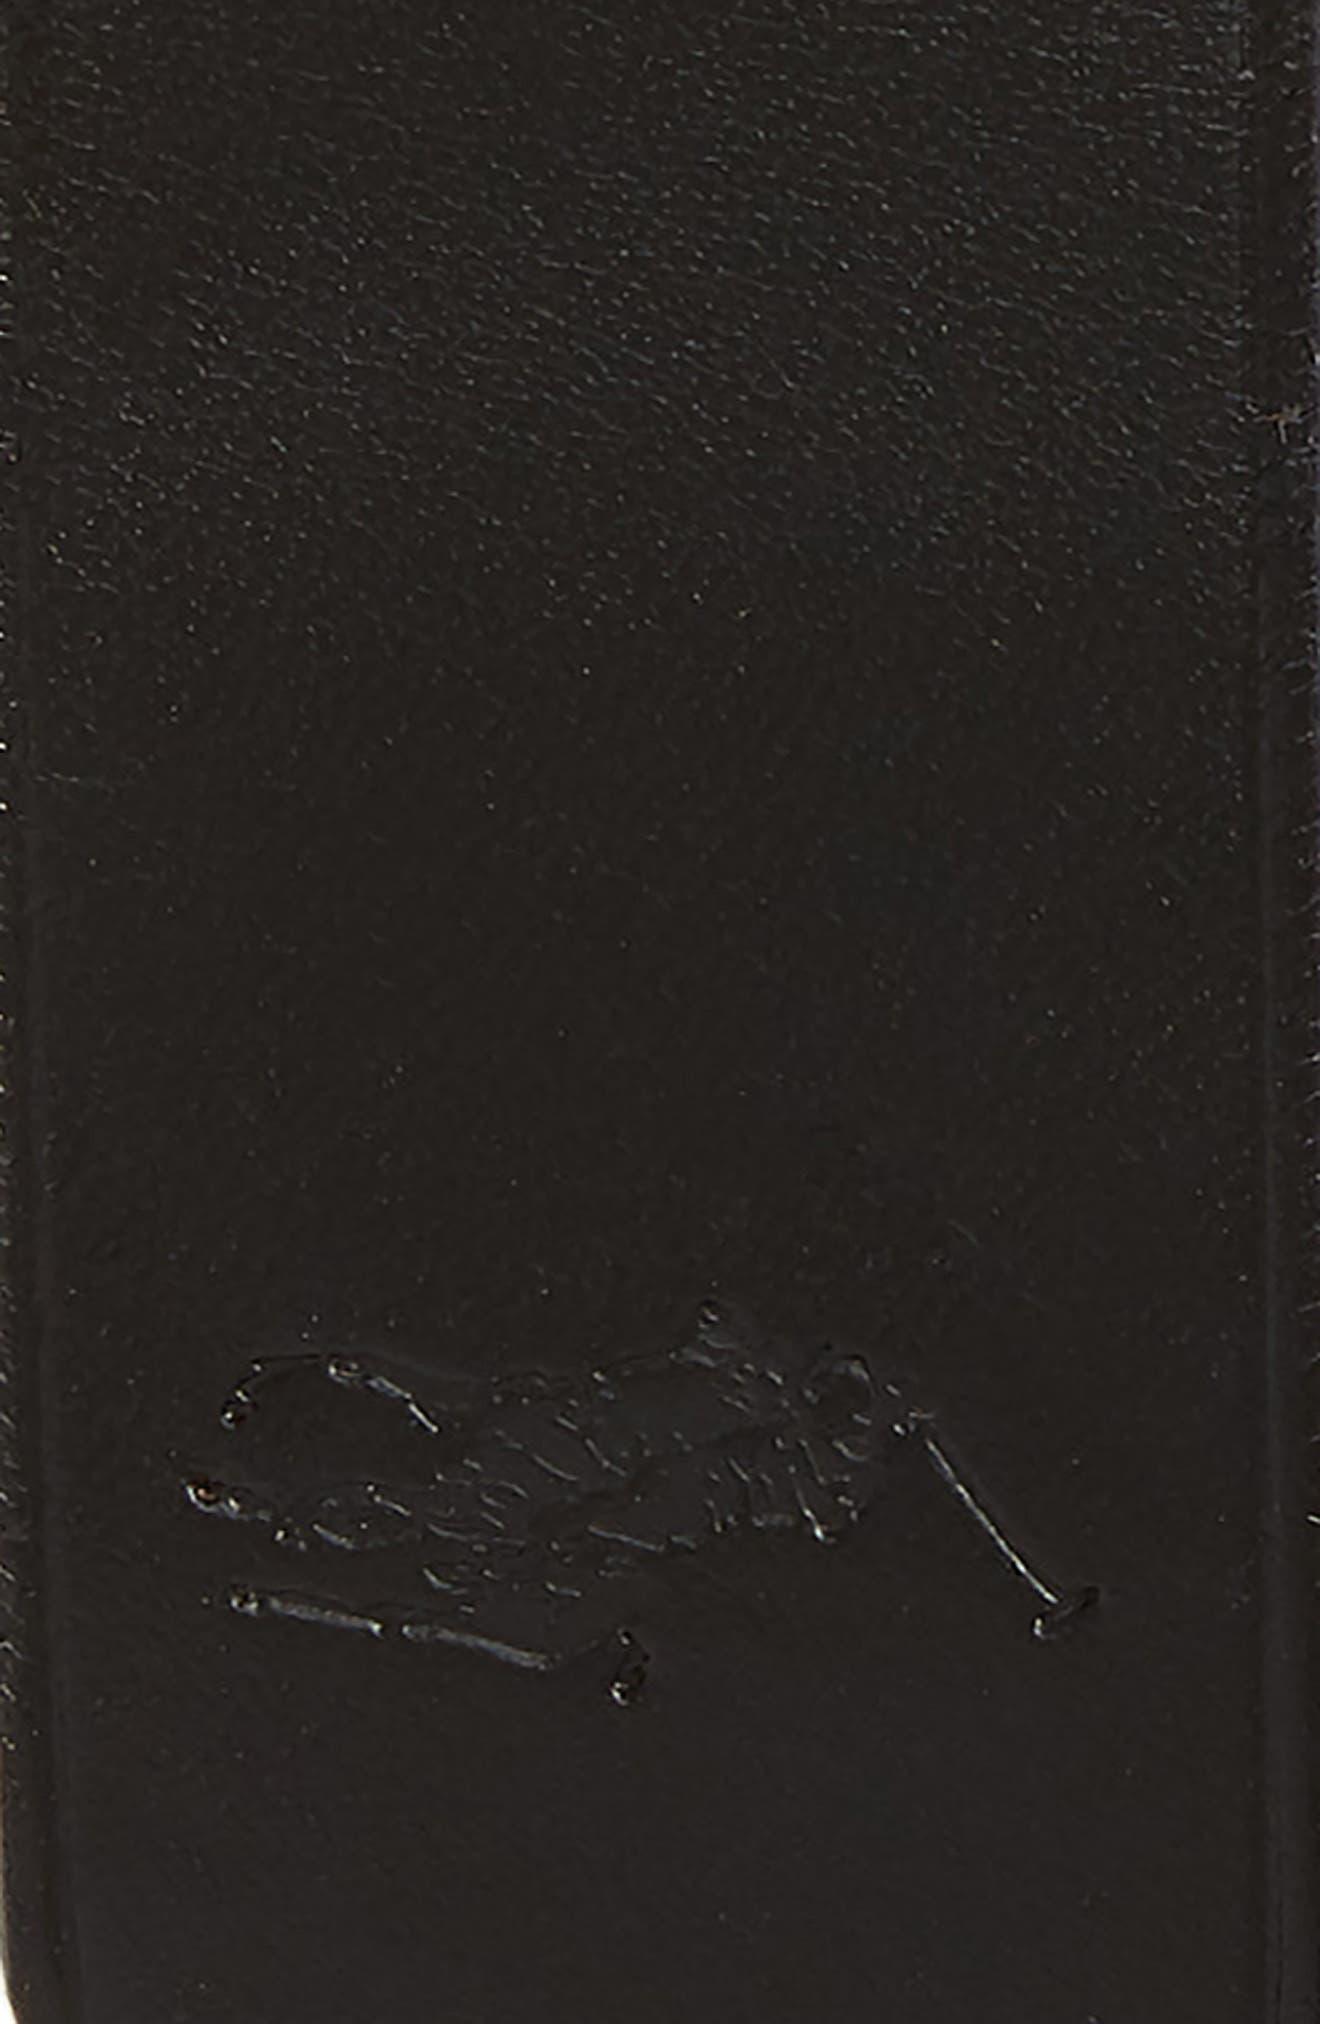 Reversible Leather Belt,                             Alternate thumbnail 2, color,                             Black/ Brown